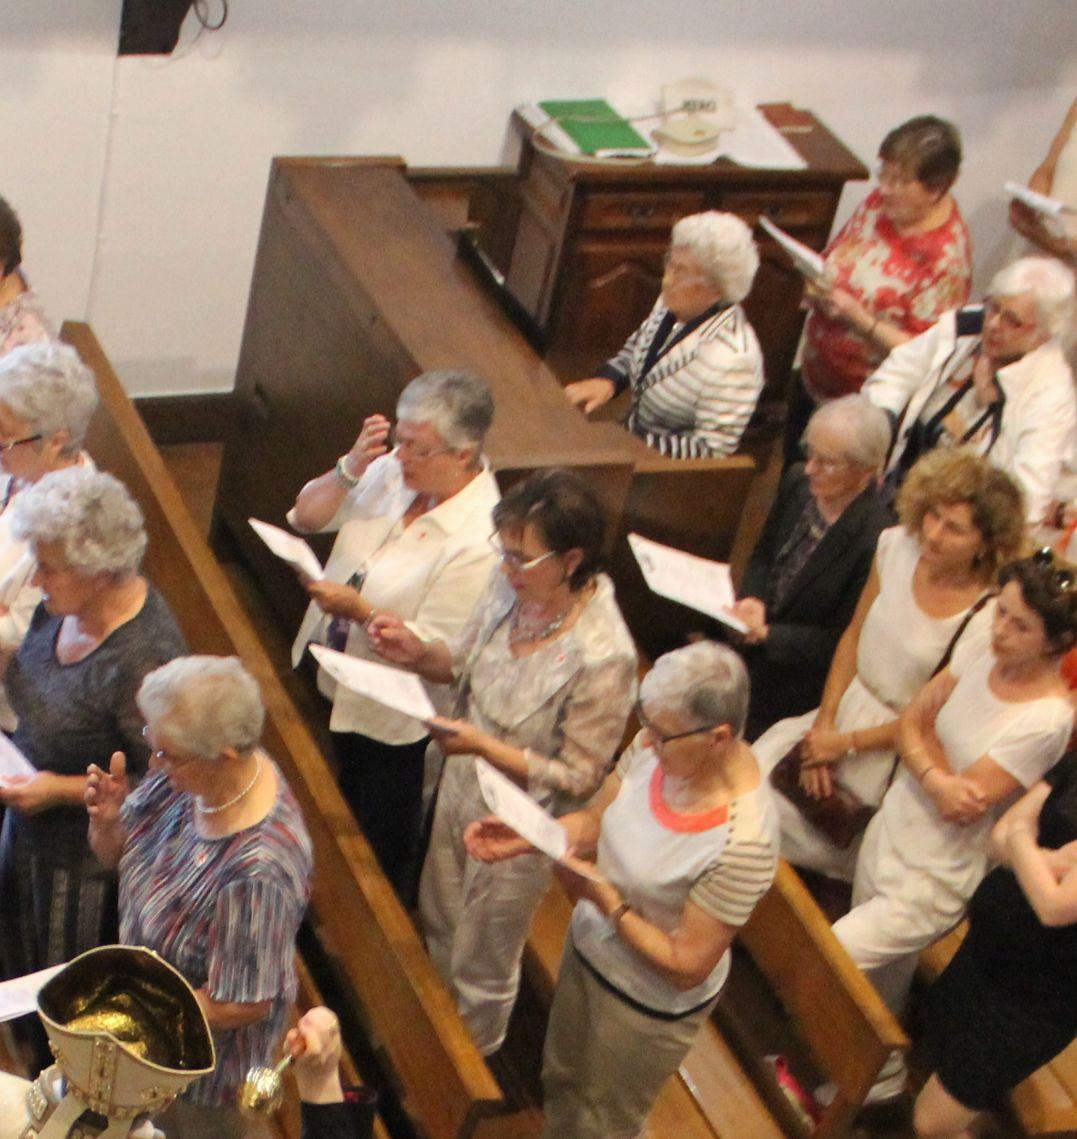 A l'harmonium, Fifine, 72 ans d'accompagnement musical !